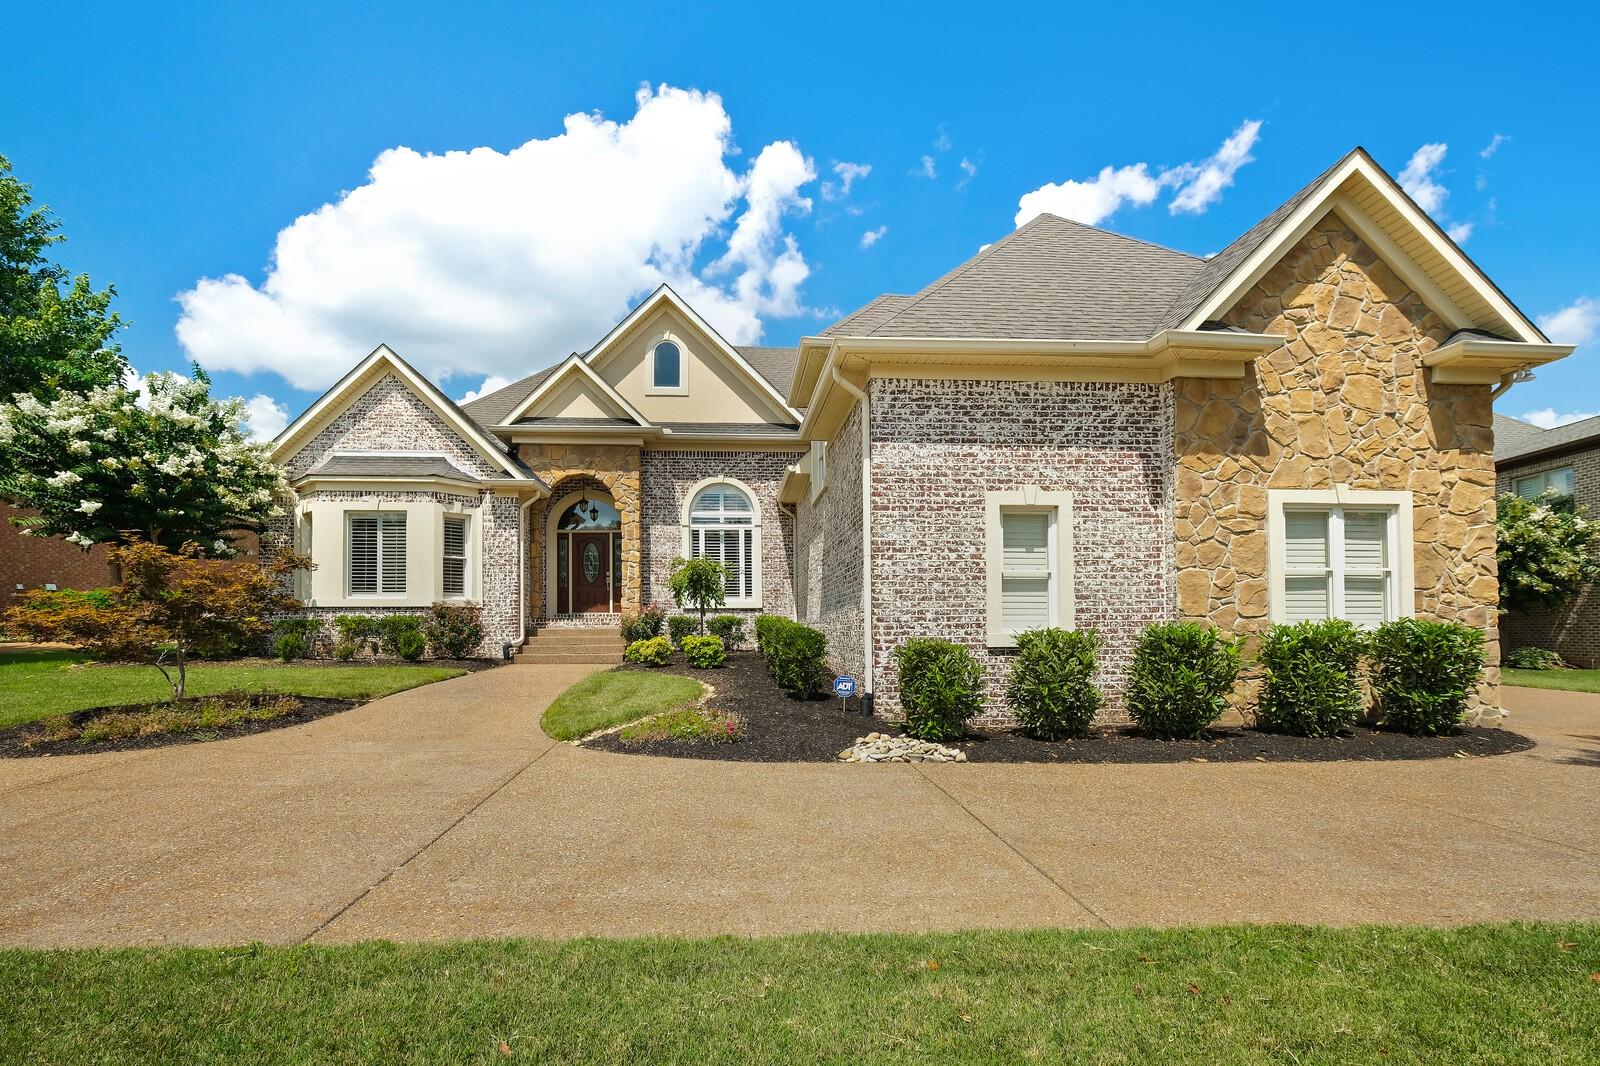 603 Ridgecrest Ln Property Photo 1